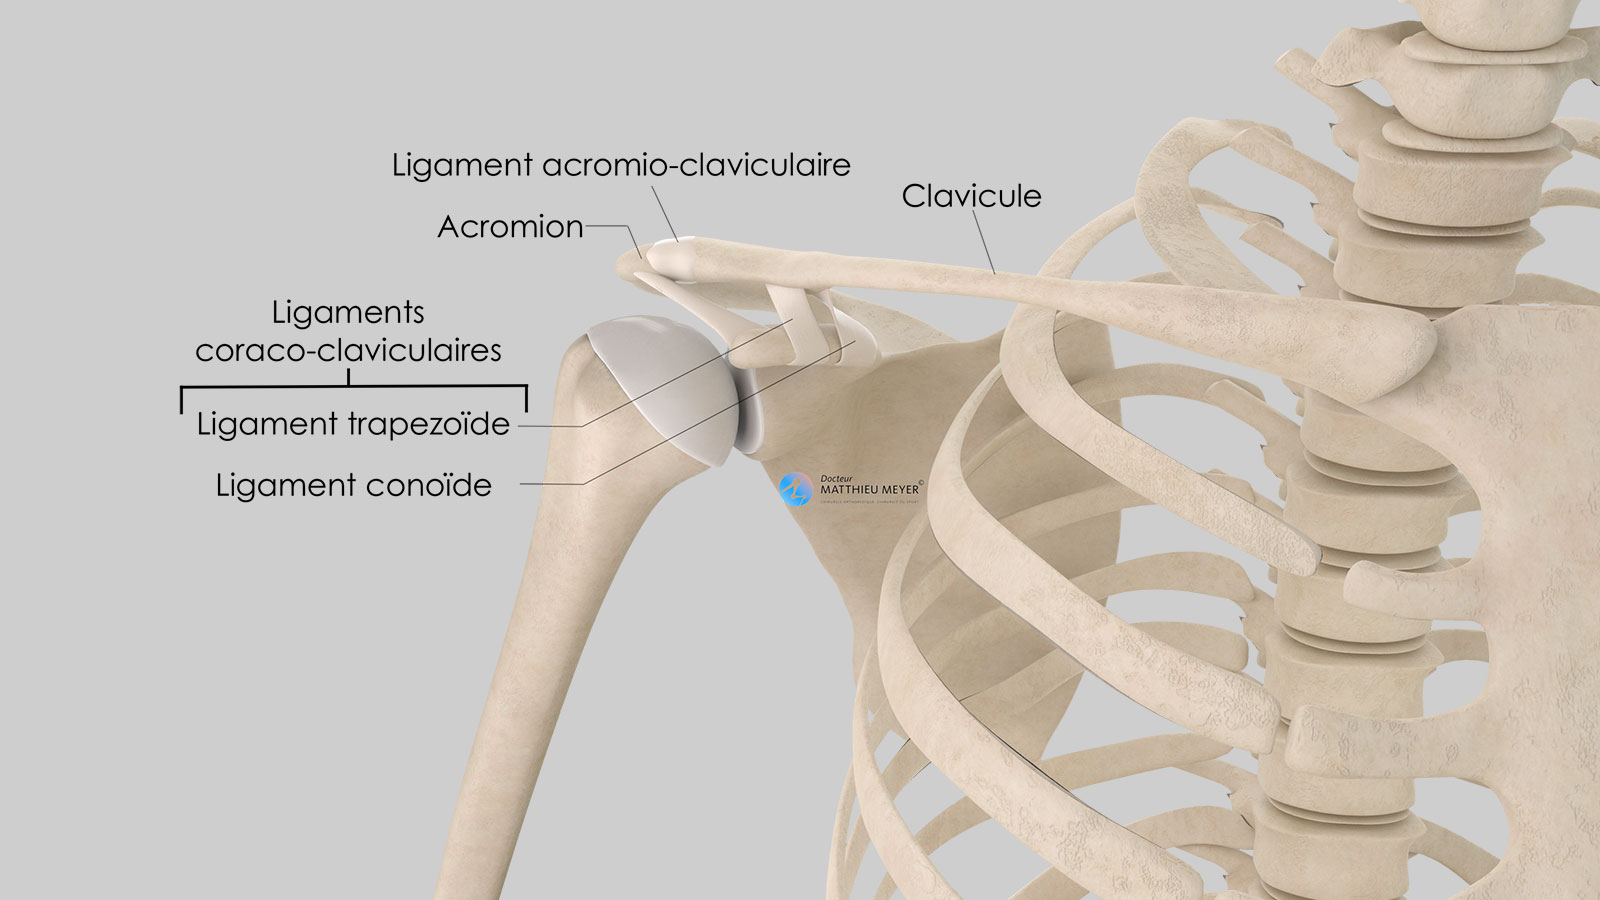 Anatomie de l'articulation acromio-claviculaire